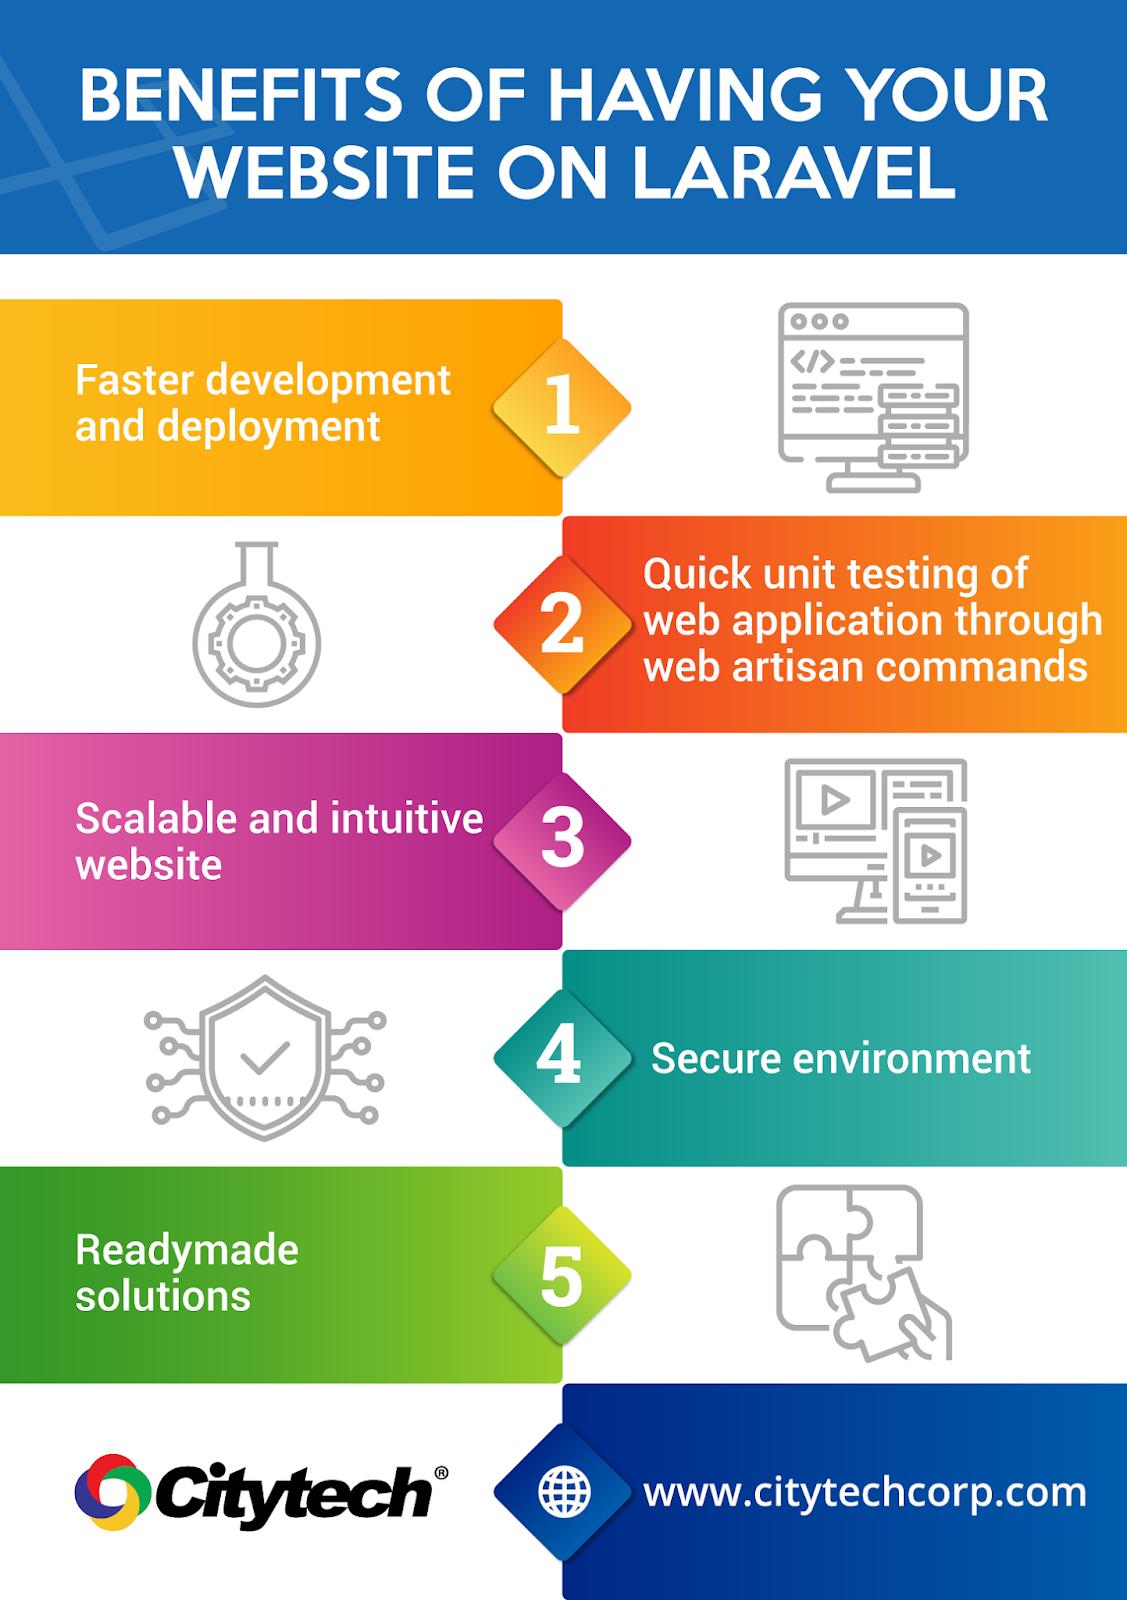 Benefits of having your website on Laravel